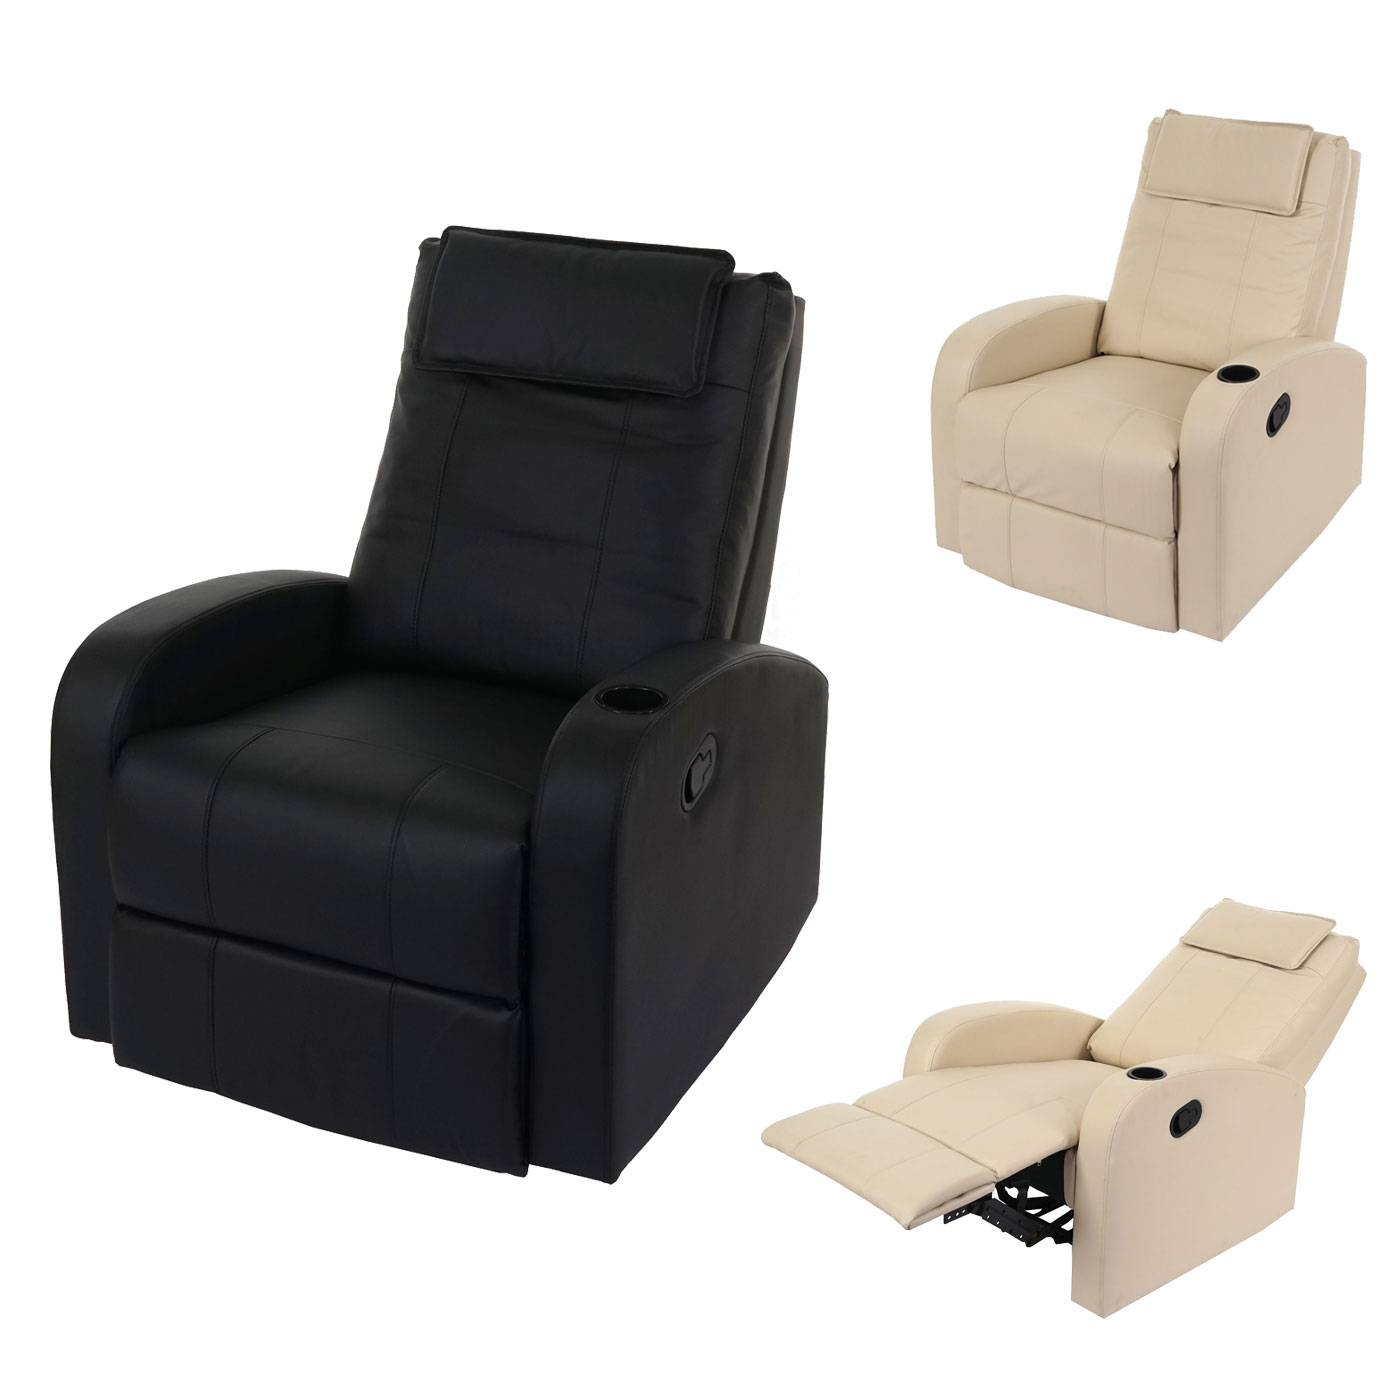 Mendler Fernsehsessel Durham, TV Sessel Relaxsessel Liegesessel, Kunstleder ~ Variantenangebot 41861+41862